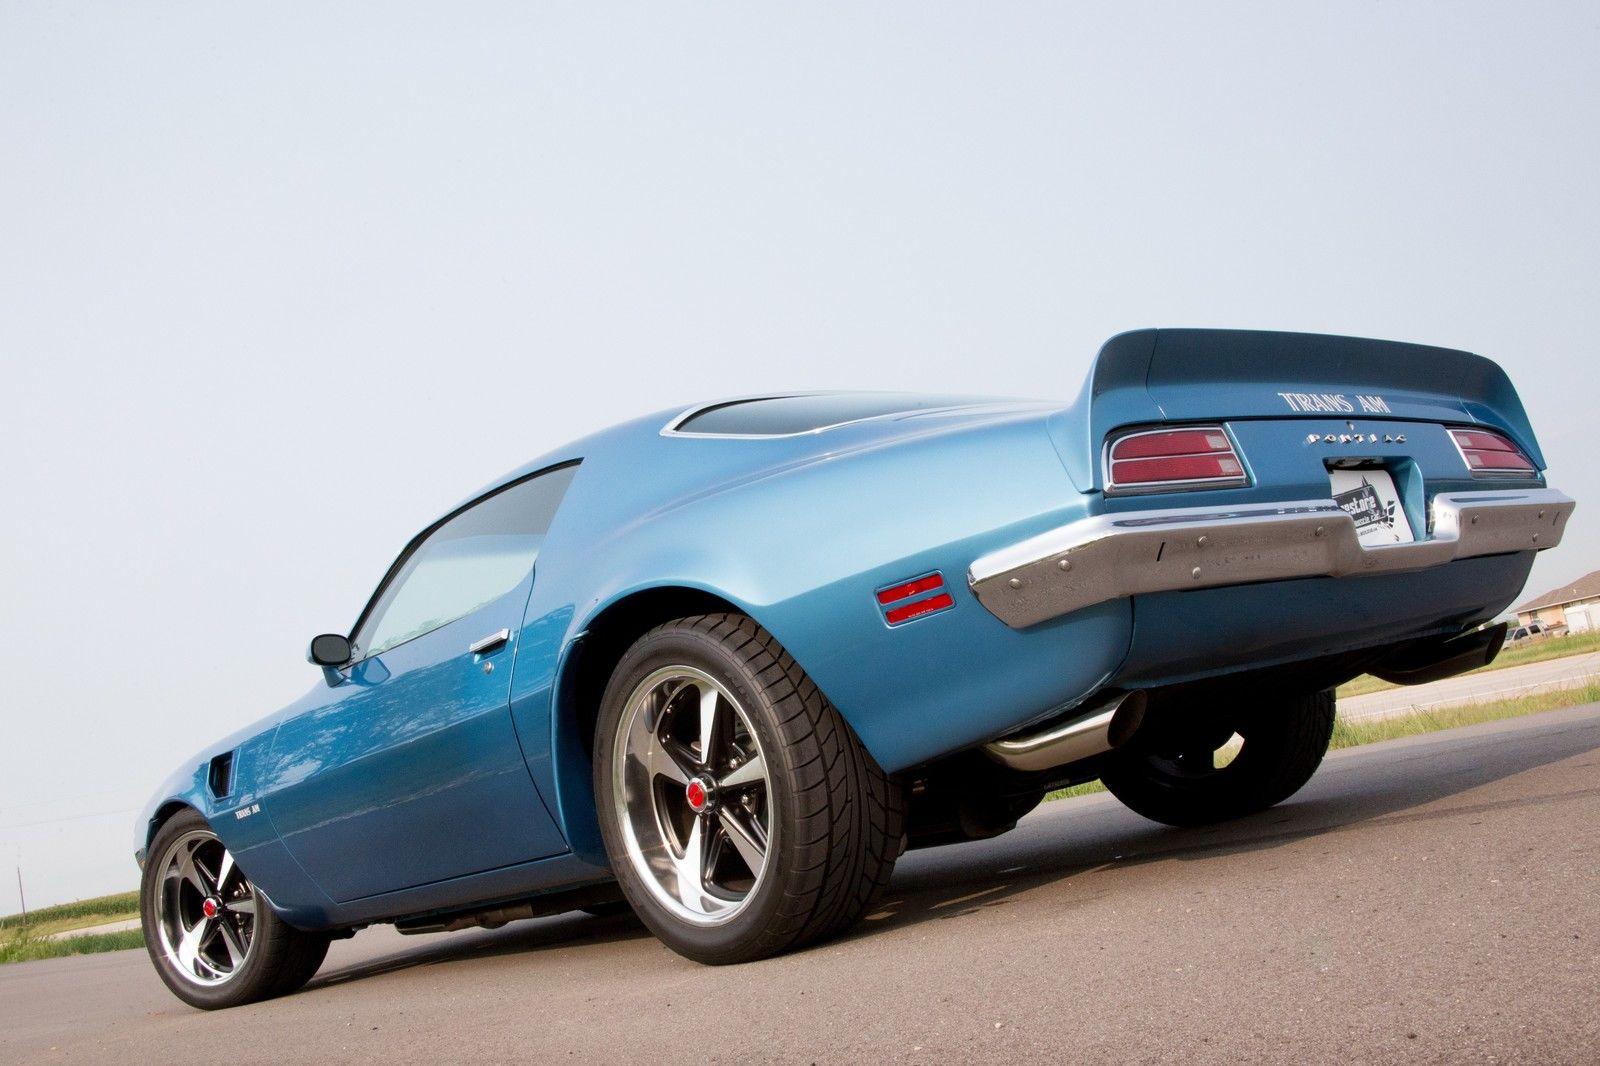 Pontiac Rally Ii Cast Wheels Full Set Plus Caps Wh 1510 02